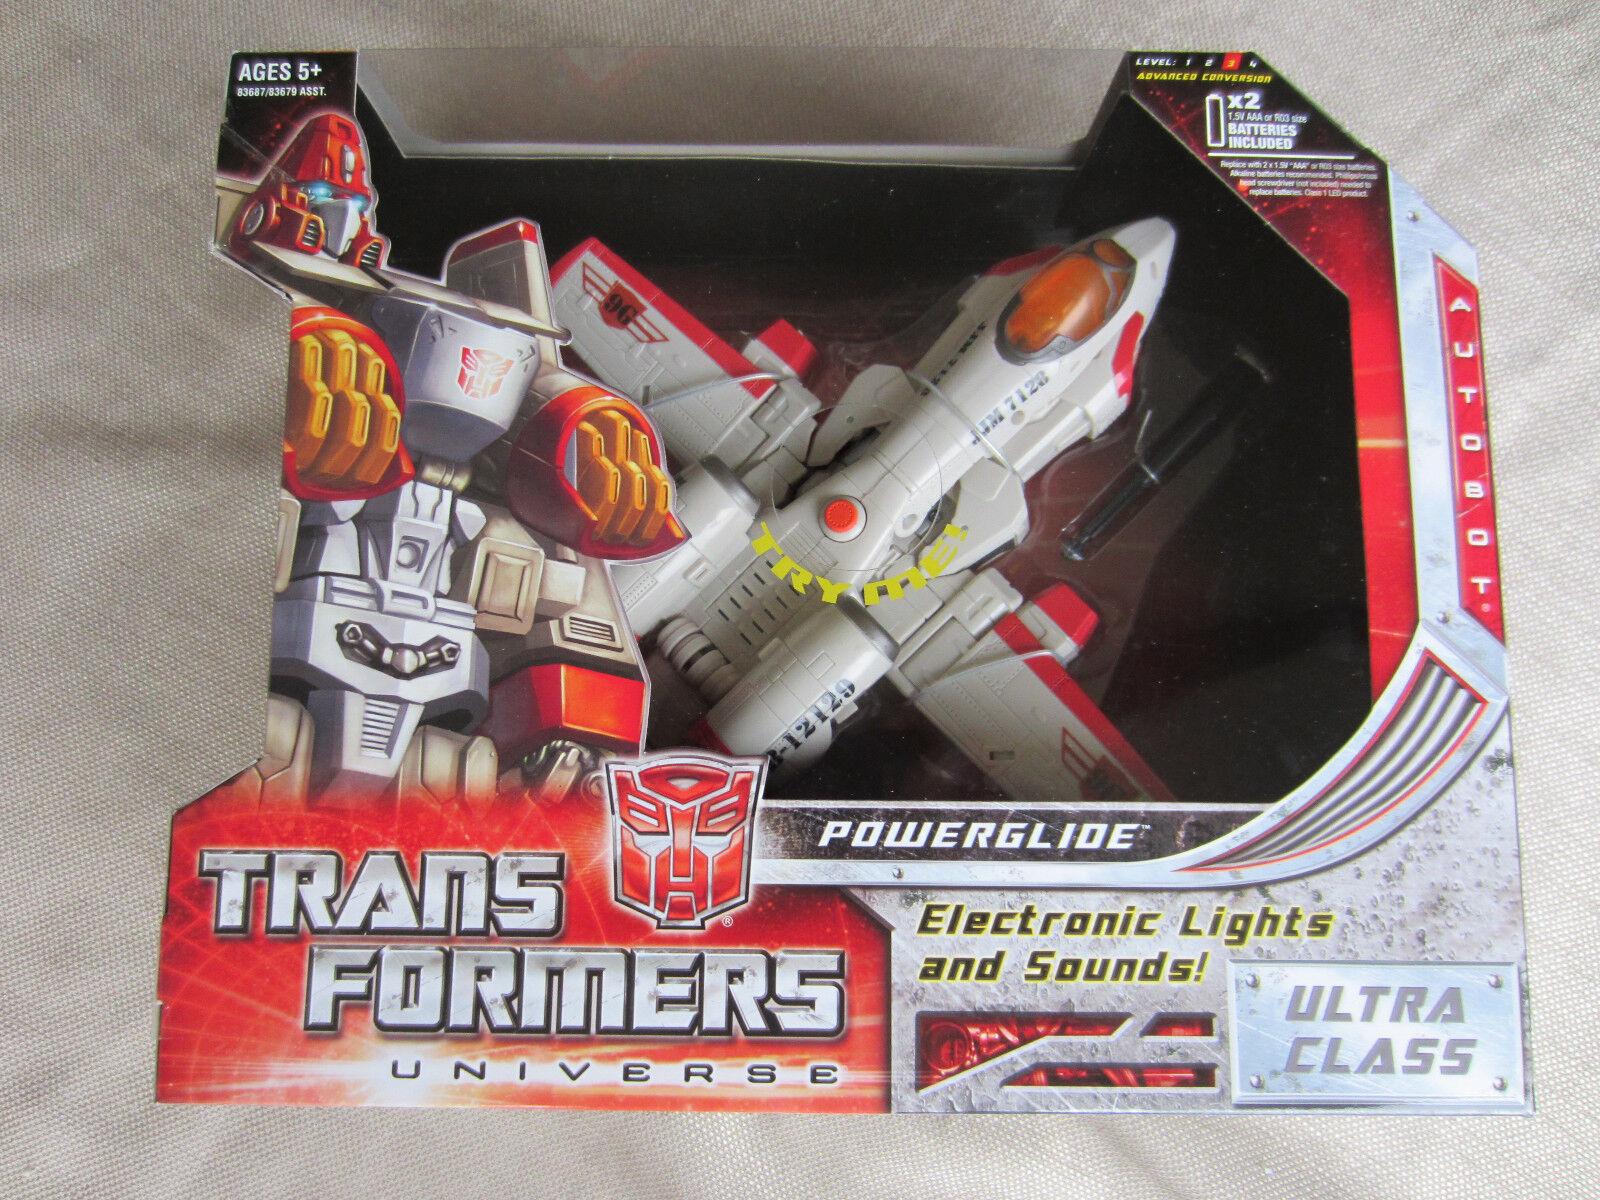 Transformers Ultra Class Univers Autobot Powerglide Hasbro Action Figure MISB